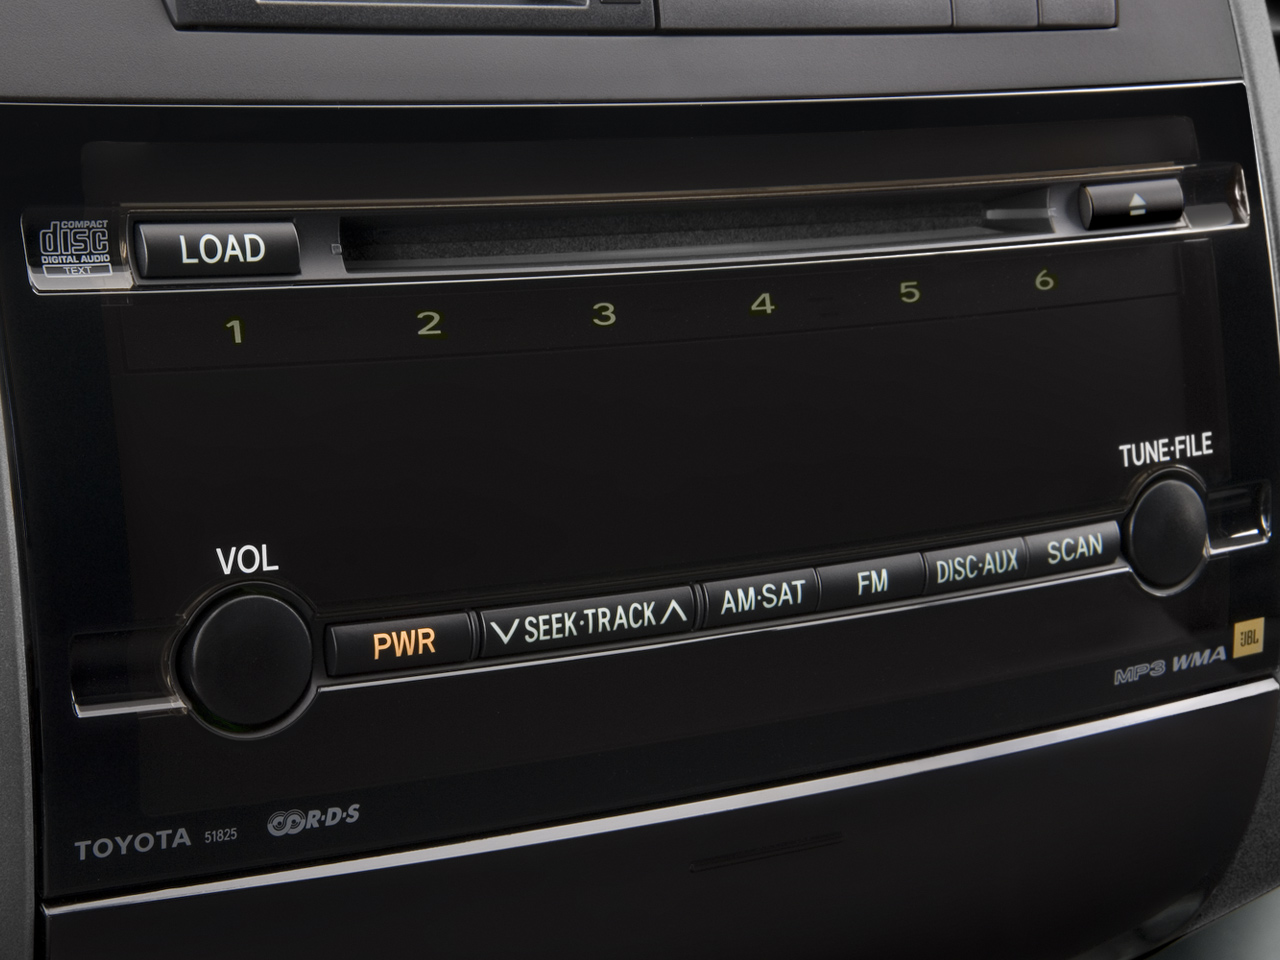 2008 Toyota Prius Touring Edition Hybrid Sedan Review Interior 43 50